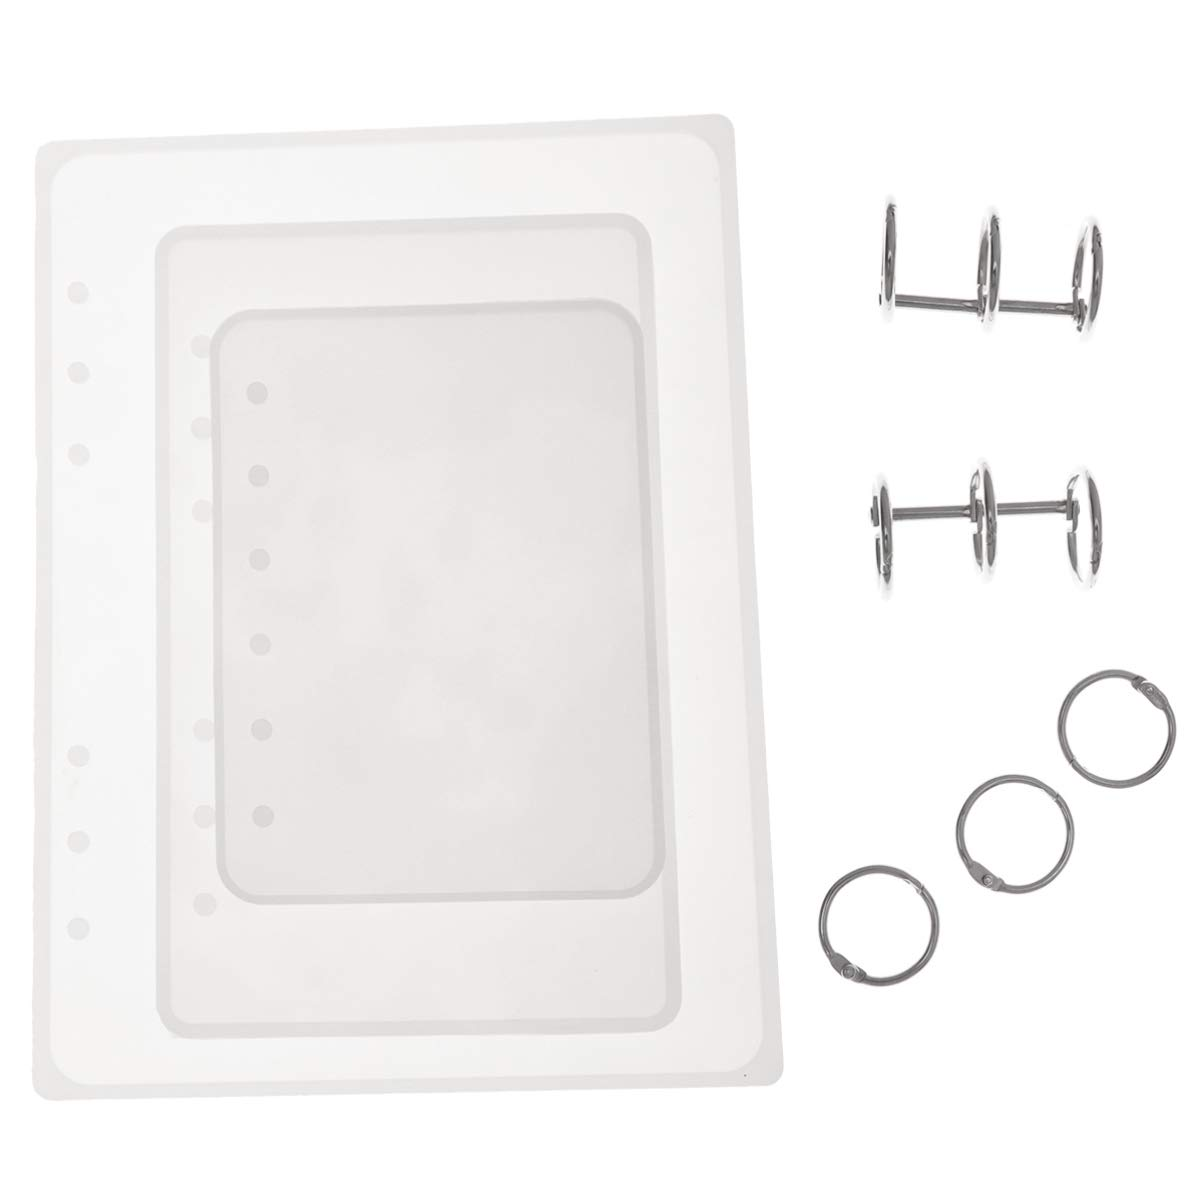 HEALLILY moldes cubierta del cuaderno a7 a6 a5 silicona moldes de fundici/ón reutilizables suaves molde port/átil epoxi con anillos de uni/ón para embarcaciones